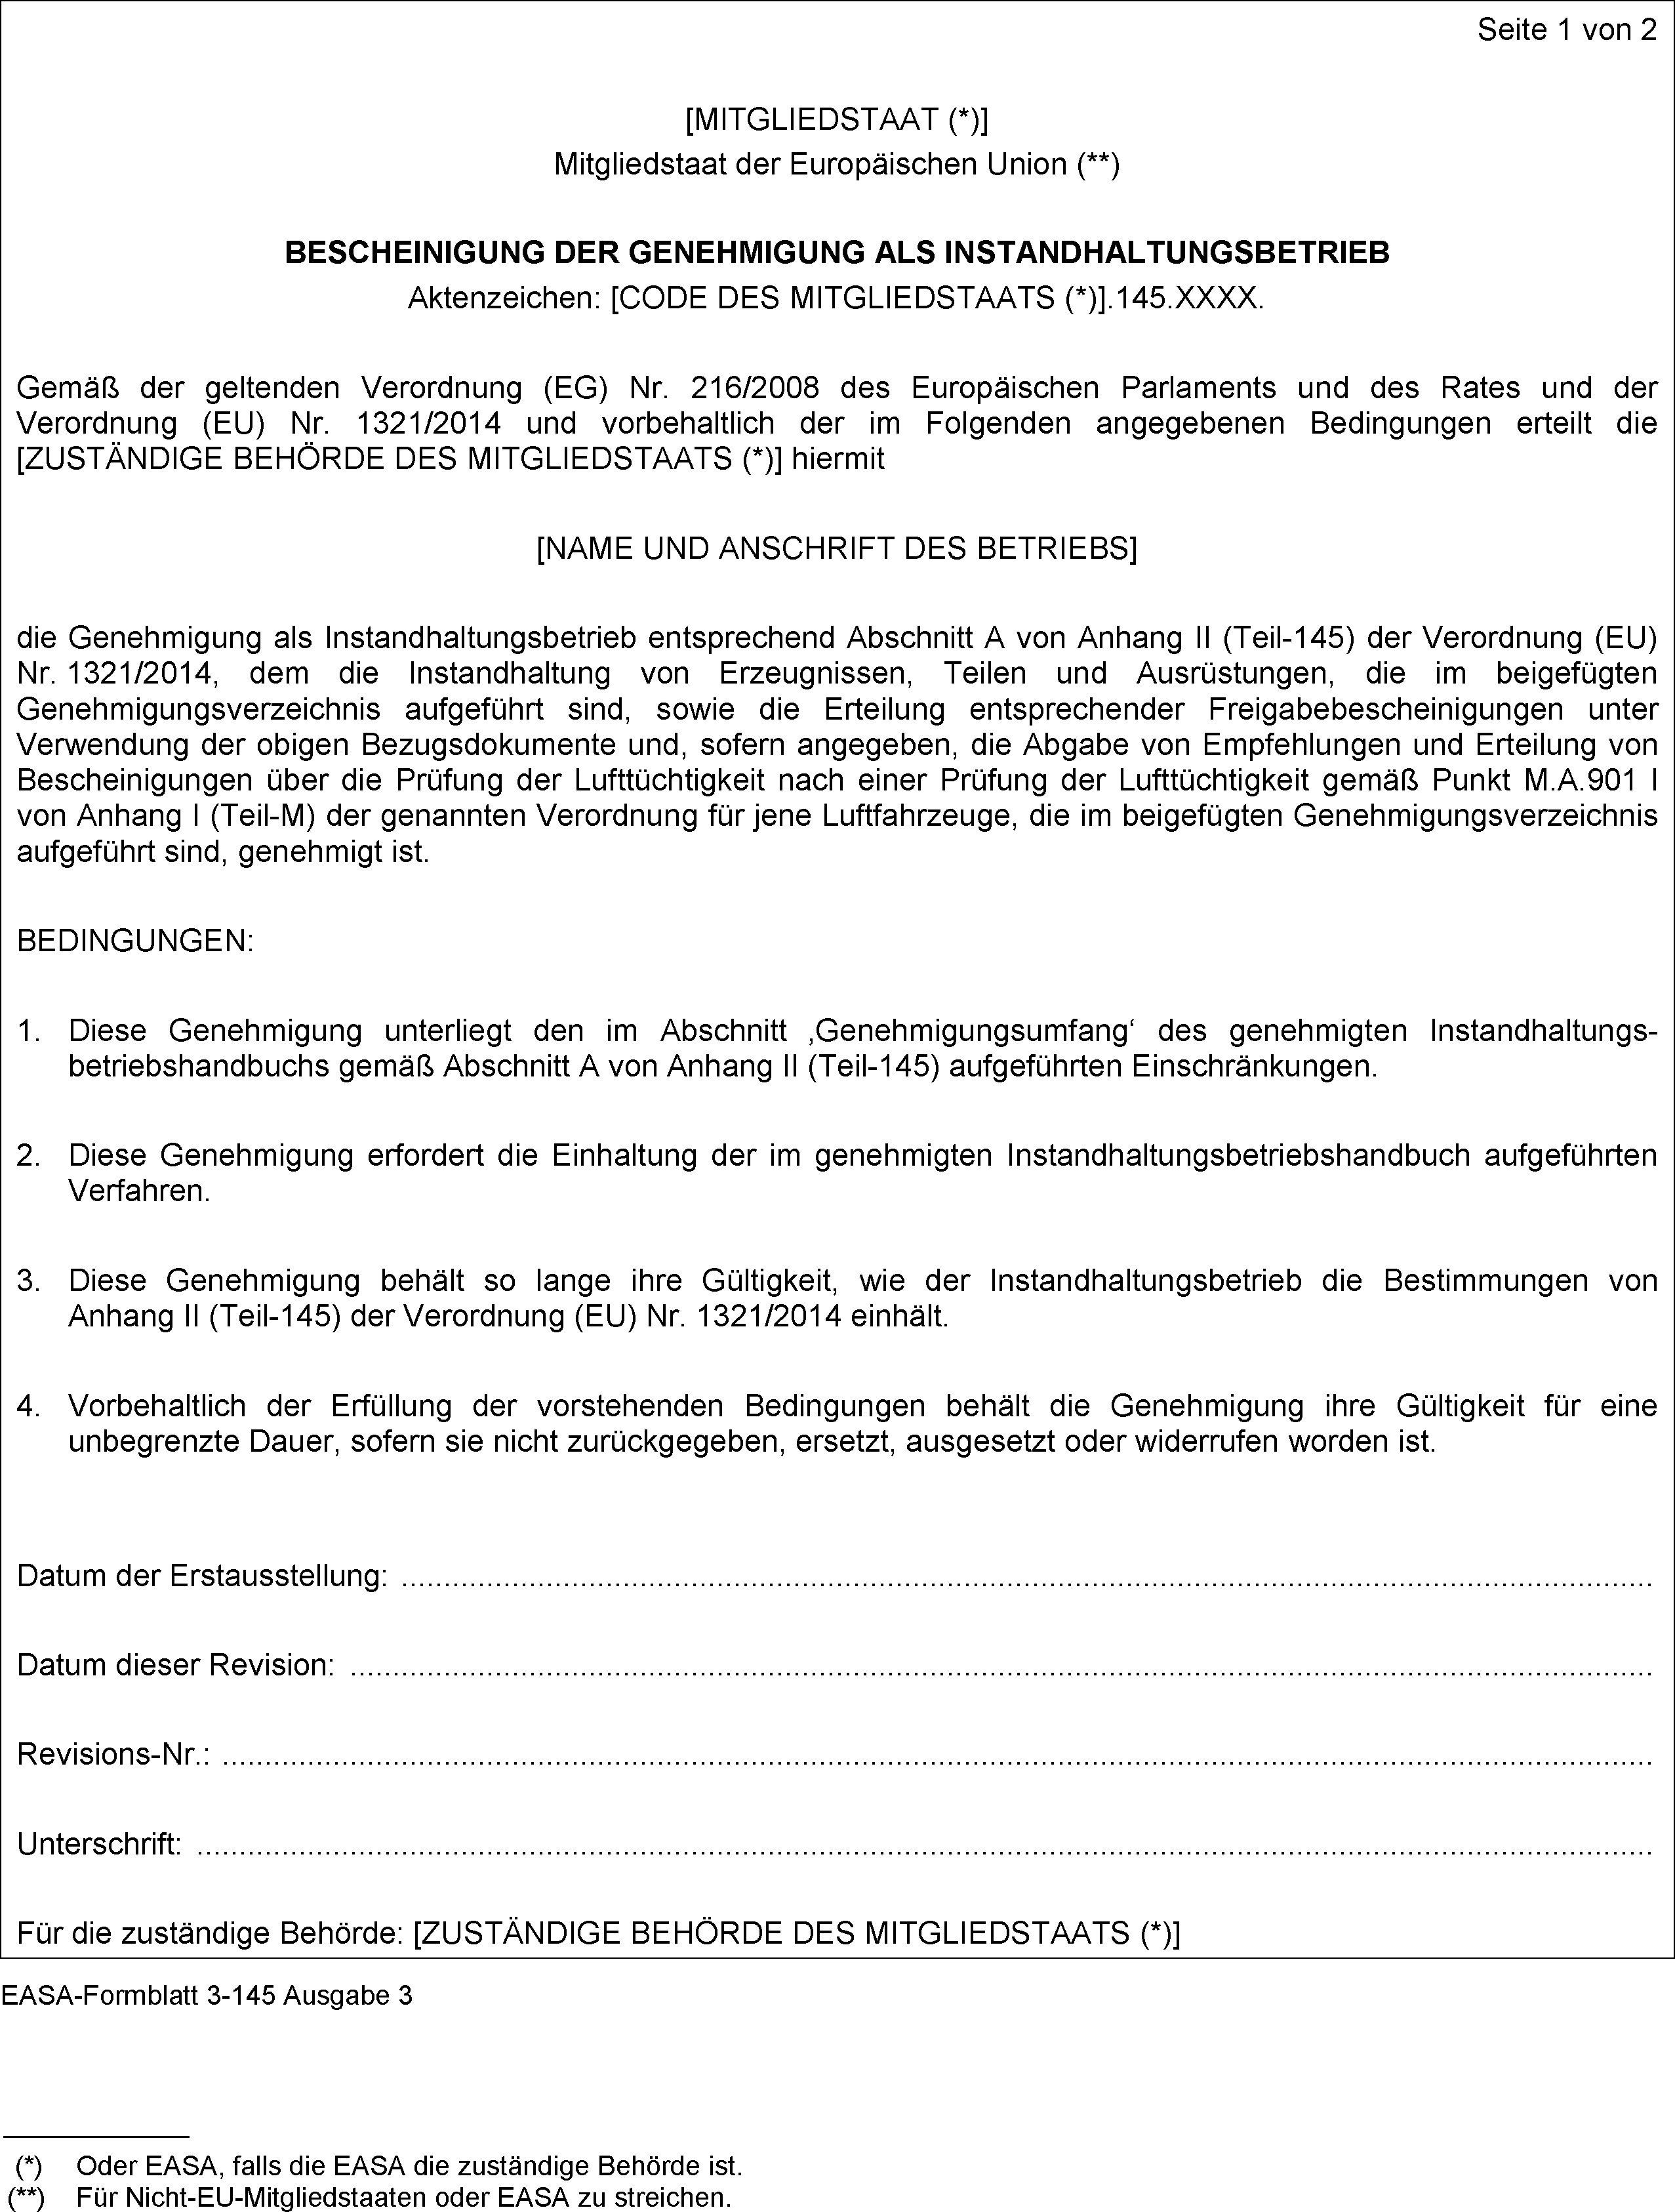 Erfreut 7 Wege Schaltplan Des Versorgungswagens Galerie - Schaltplan ...